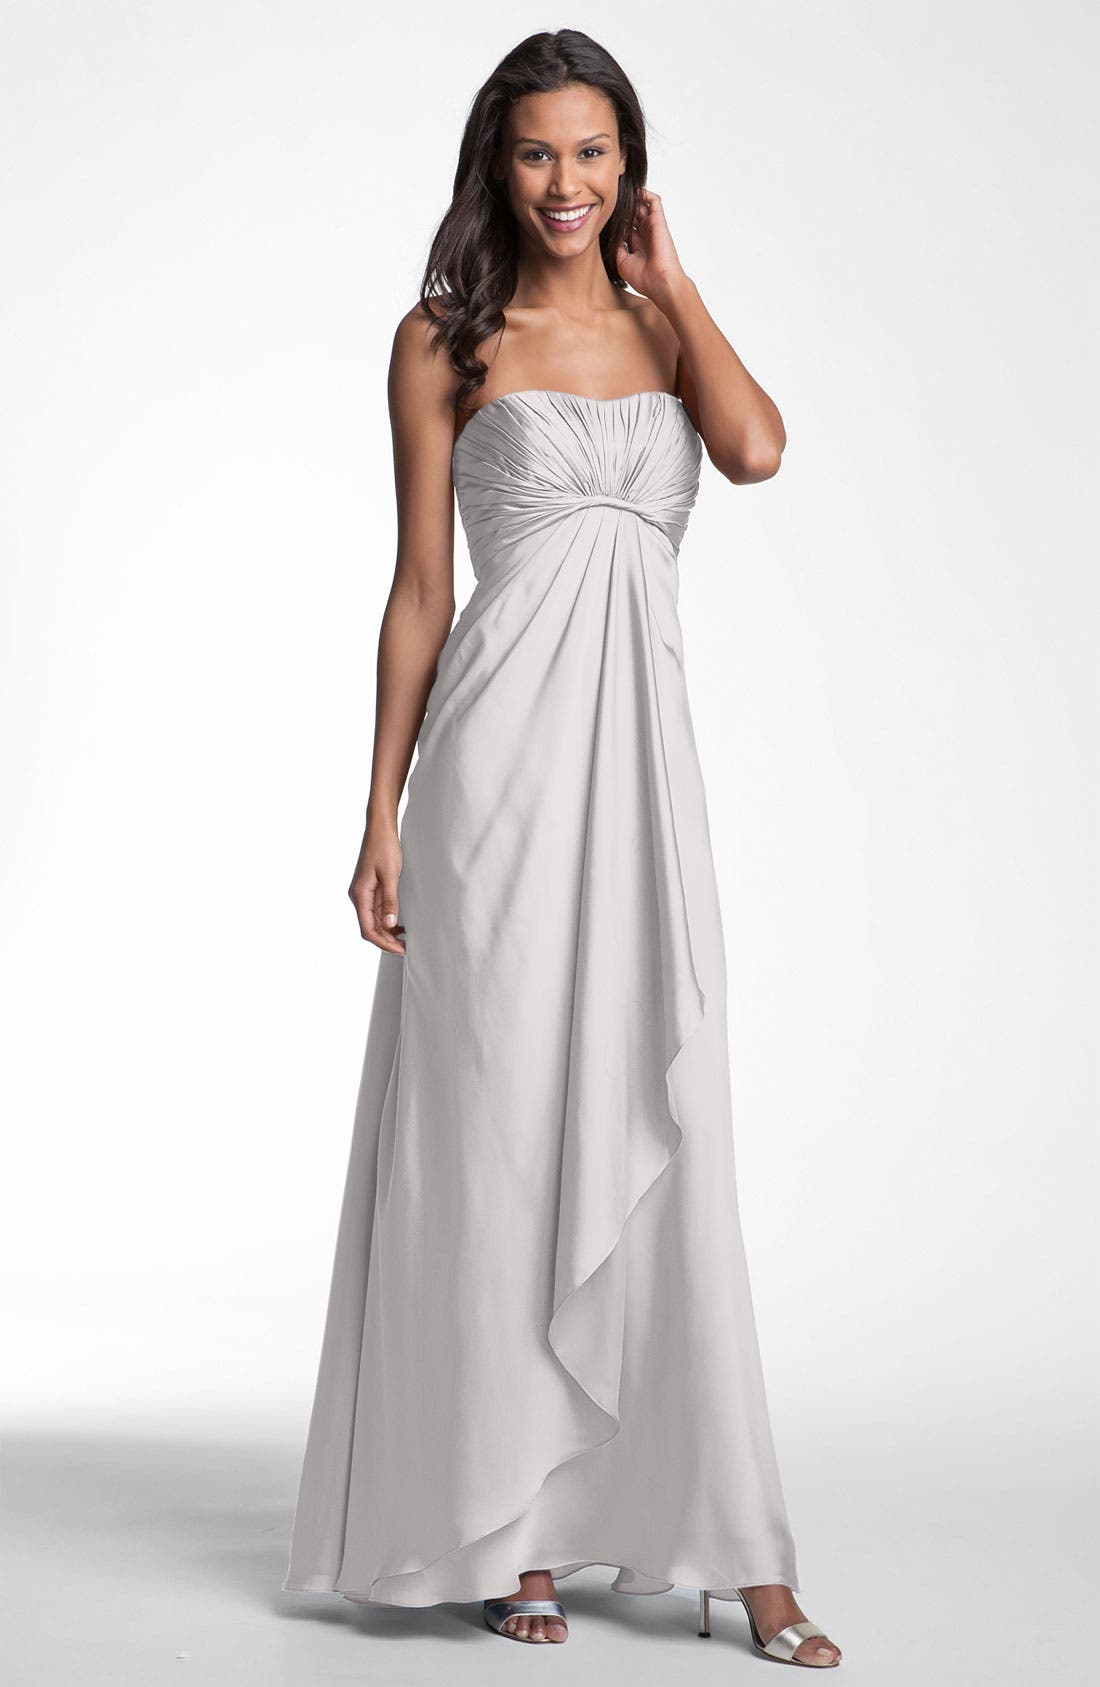 Main Image - ML Monique Lhuillier Bridesmaids Strapless Gown (Nordstrom Exclusive)